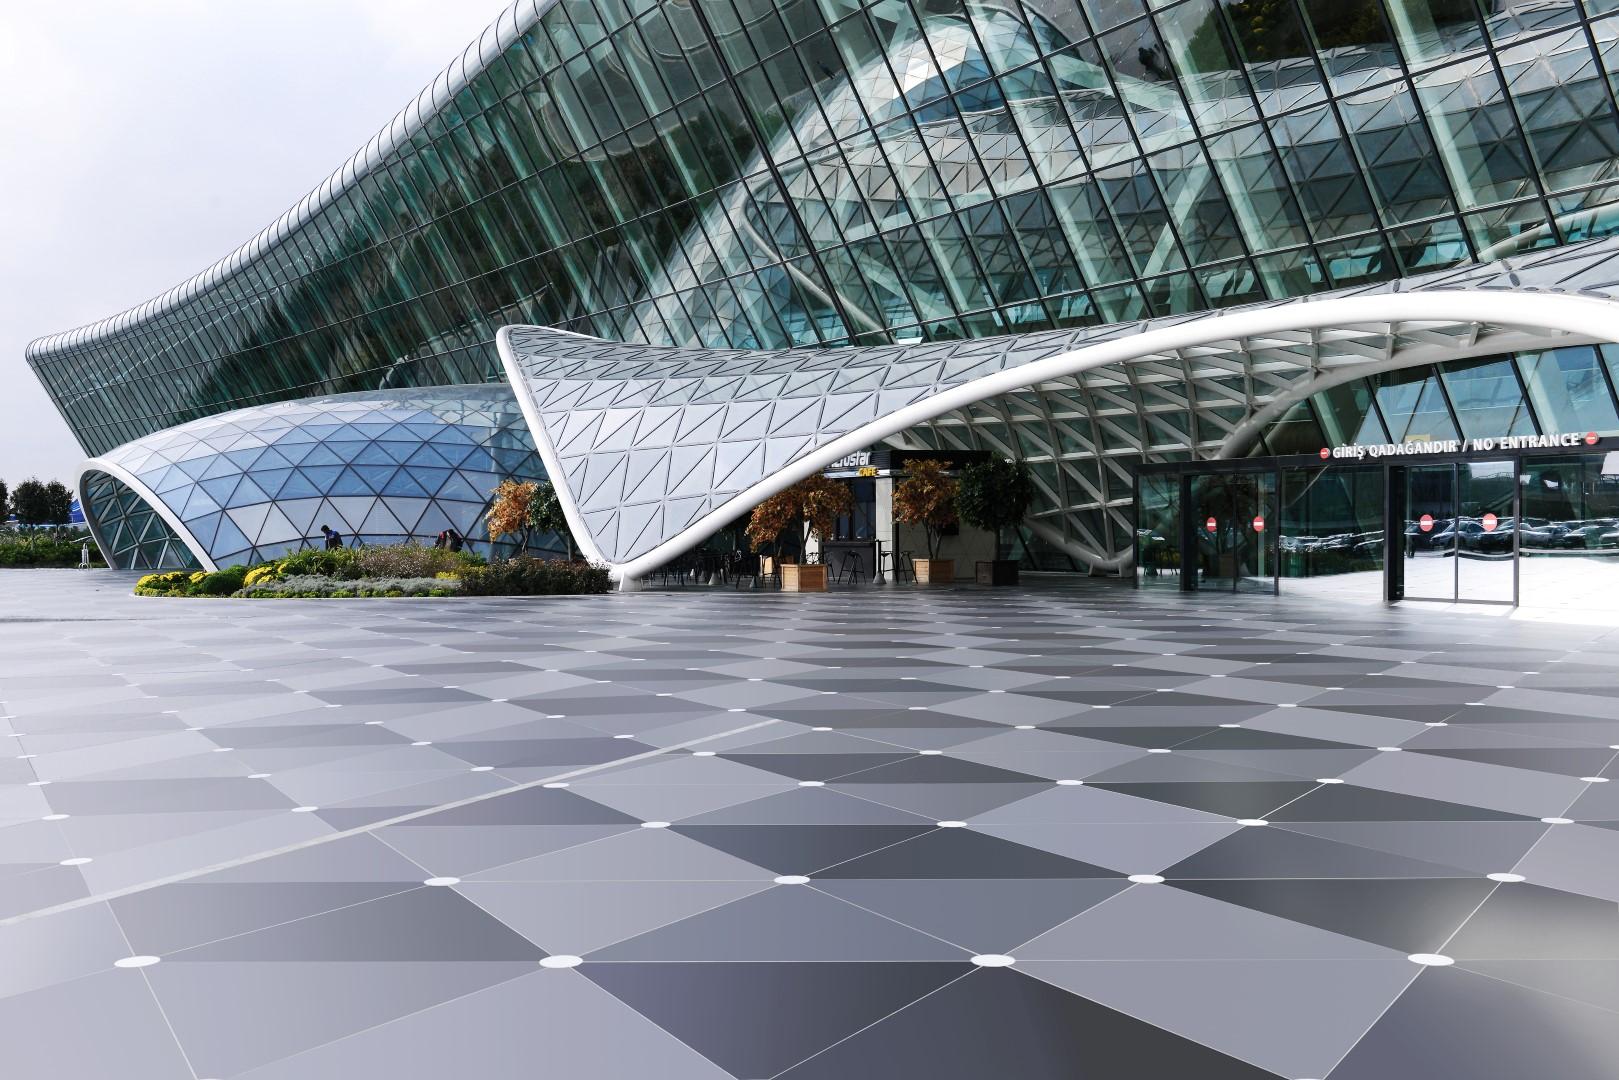 Baku Airport  - Baku airport 6 dekton id 1 51